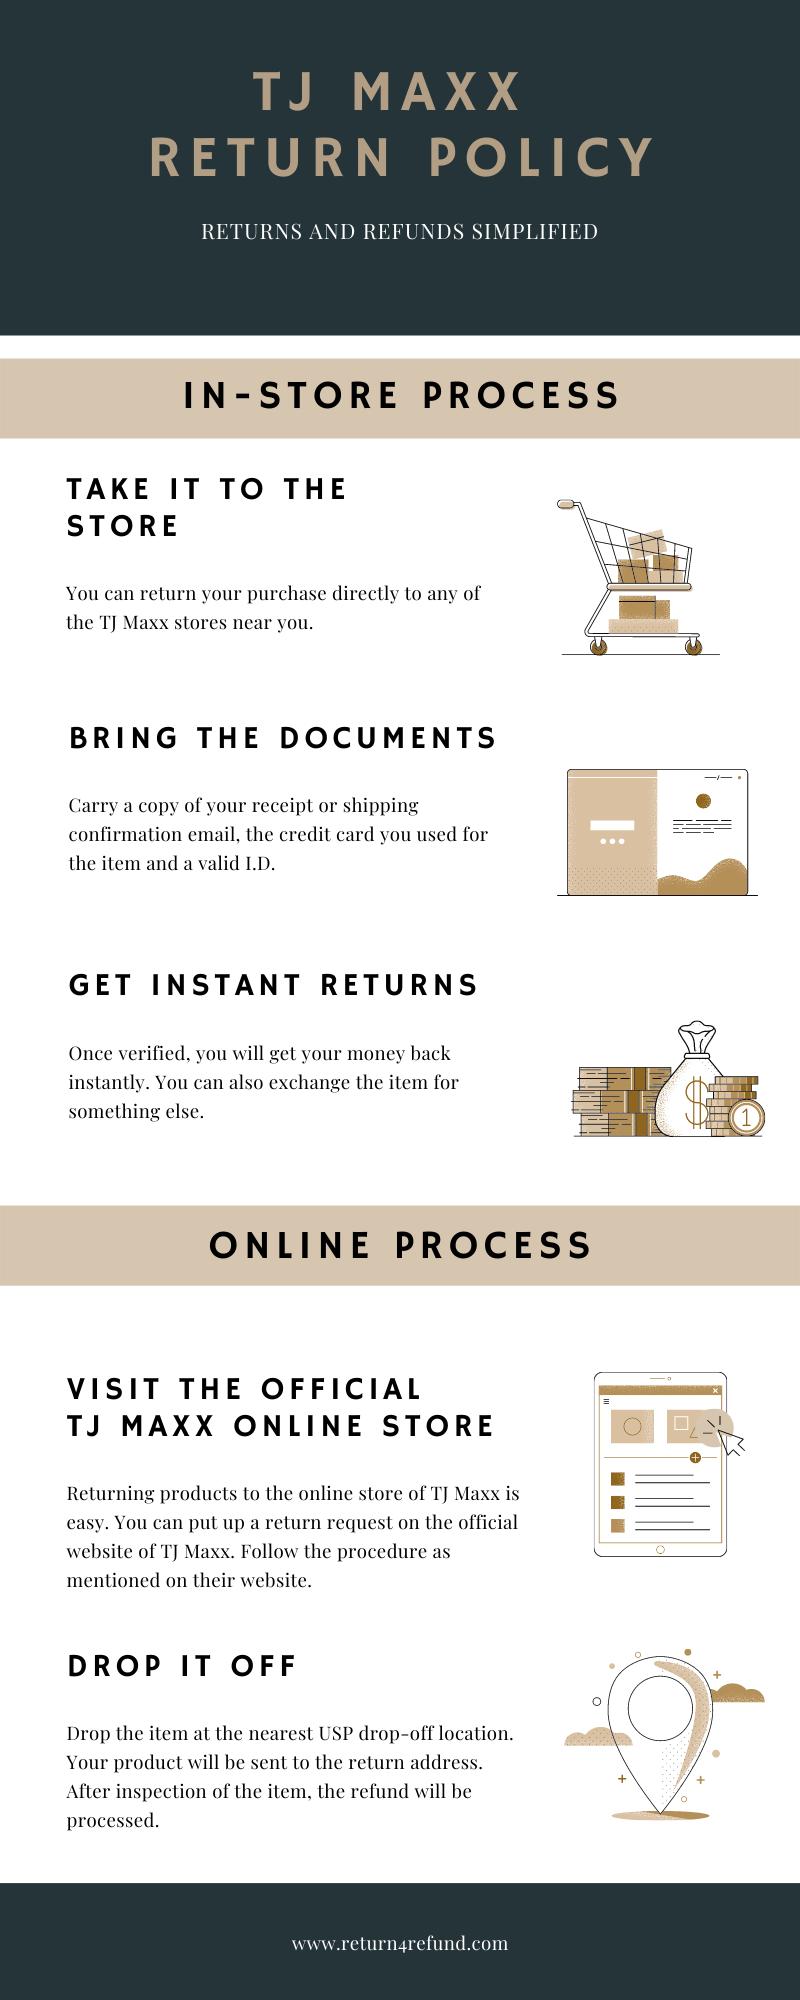 TJ Maxx Return Policy infographic